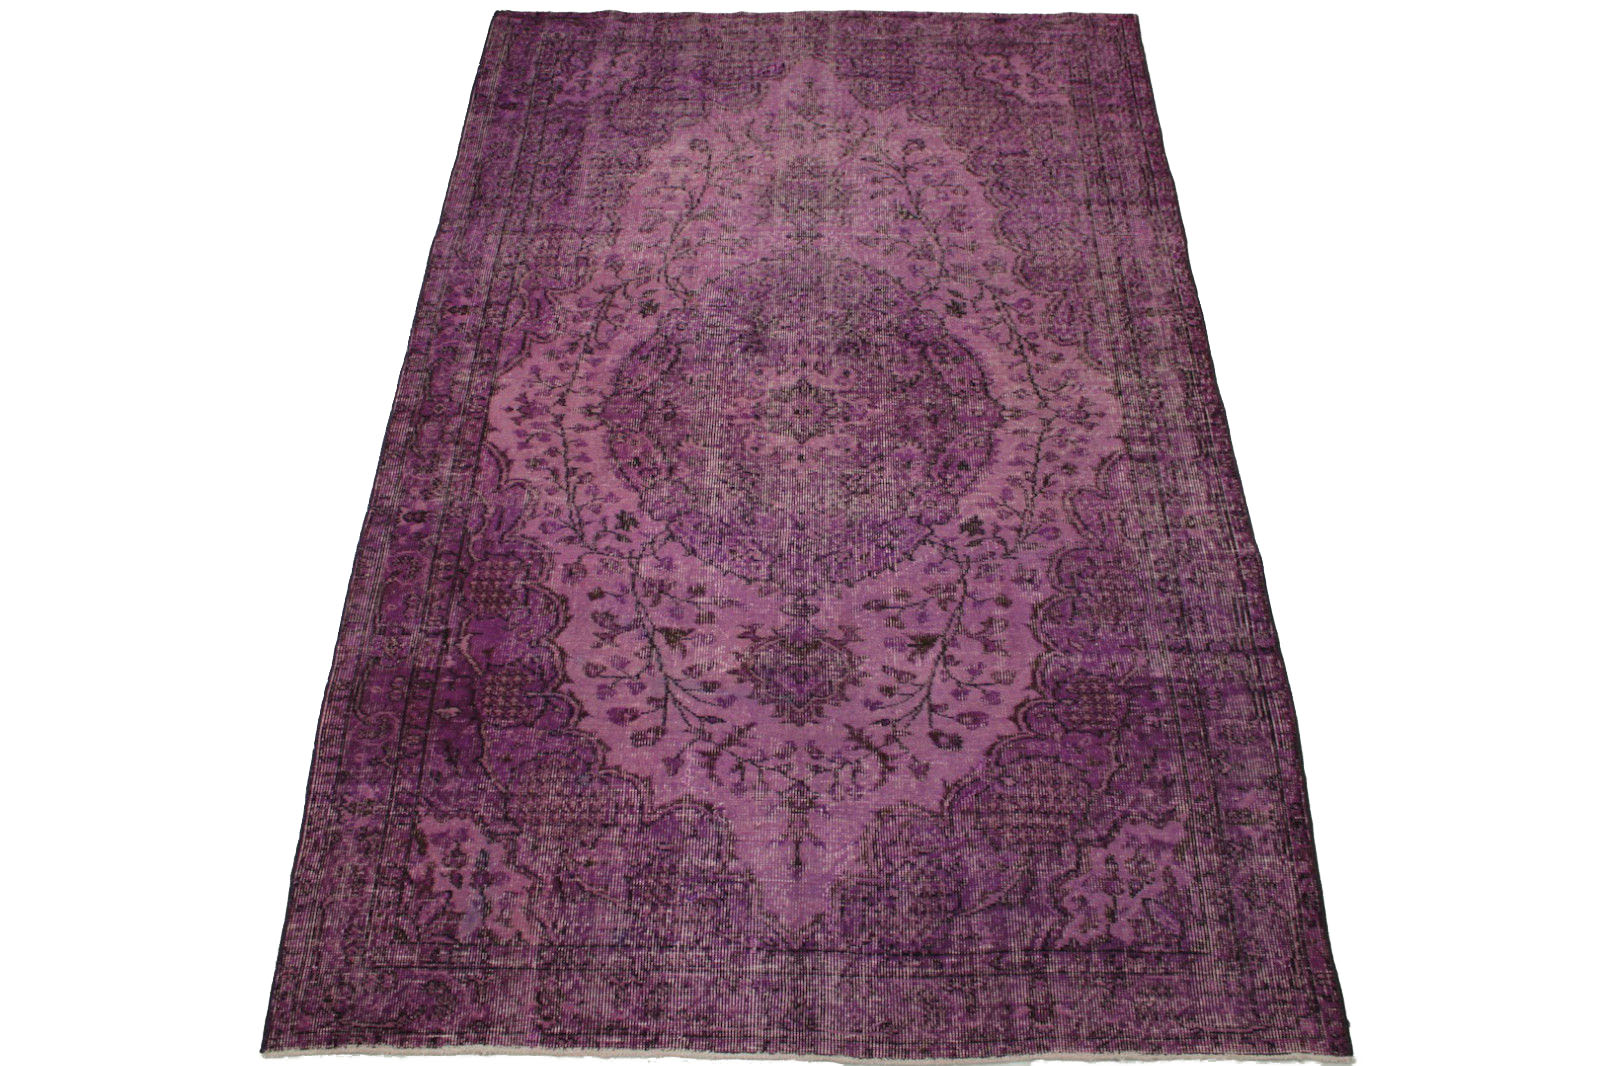 vintage teppich lila in 250x160cm 1011 11 bei kaufen. Black Bedroom Furniture Sets. Home Design Ideas